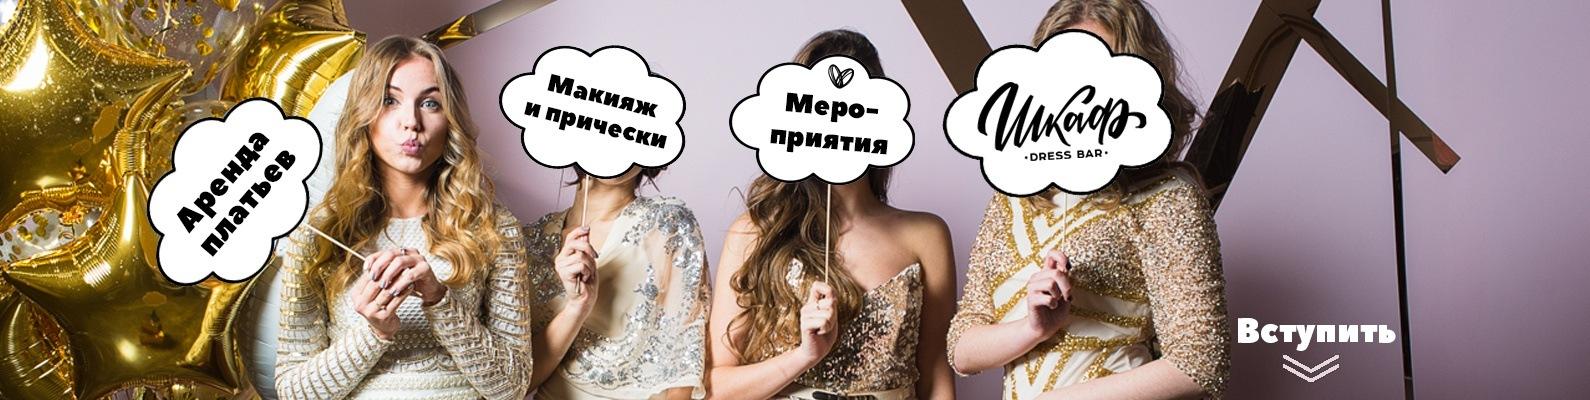 d279decdb37cc5c Аренда / Прокат платьев СПб - Dress Bar Шкаф | ВКонтакте